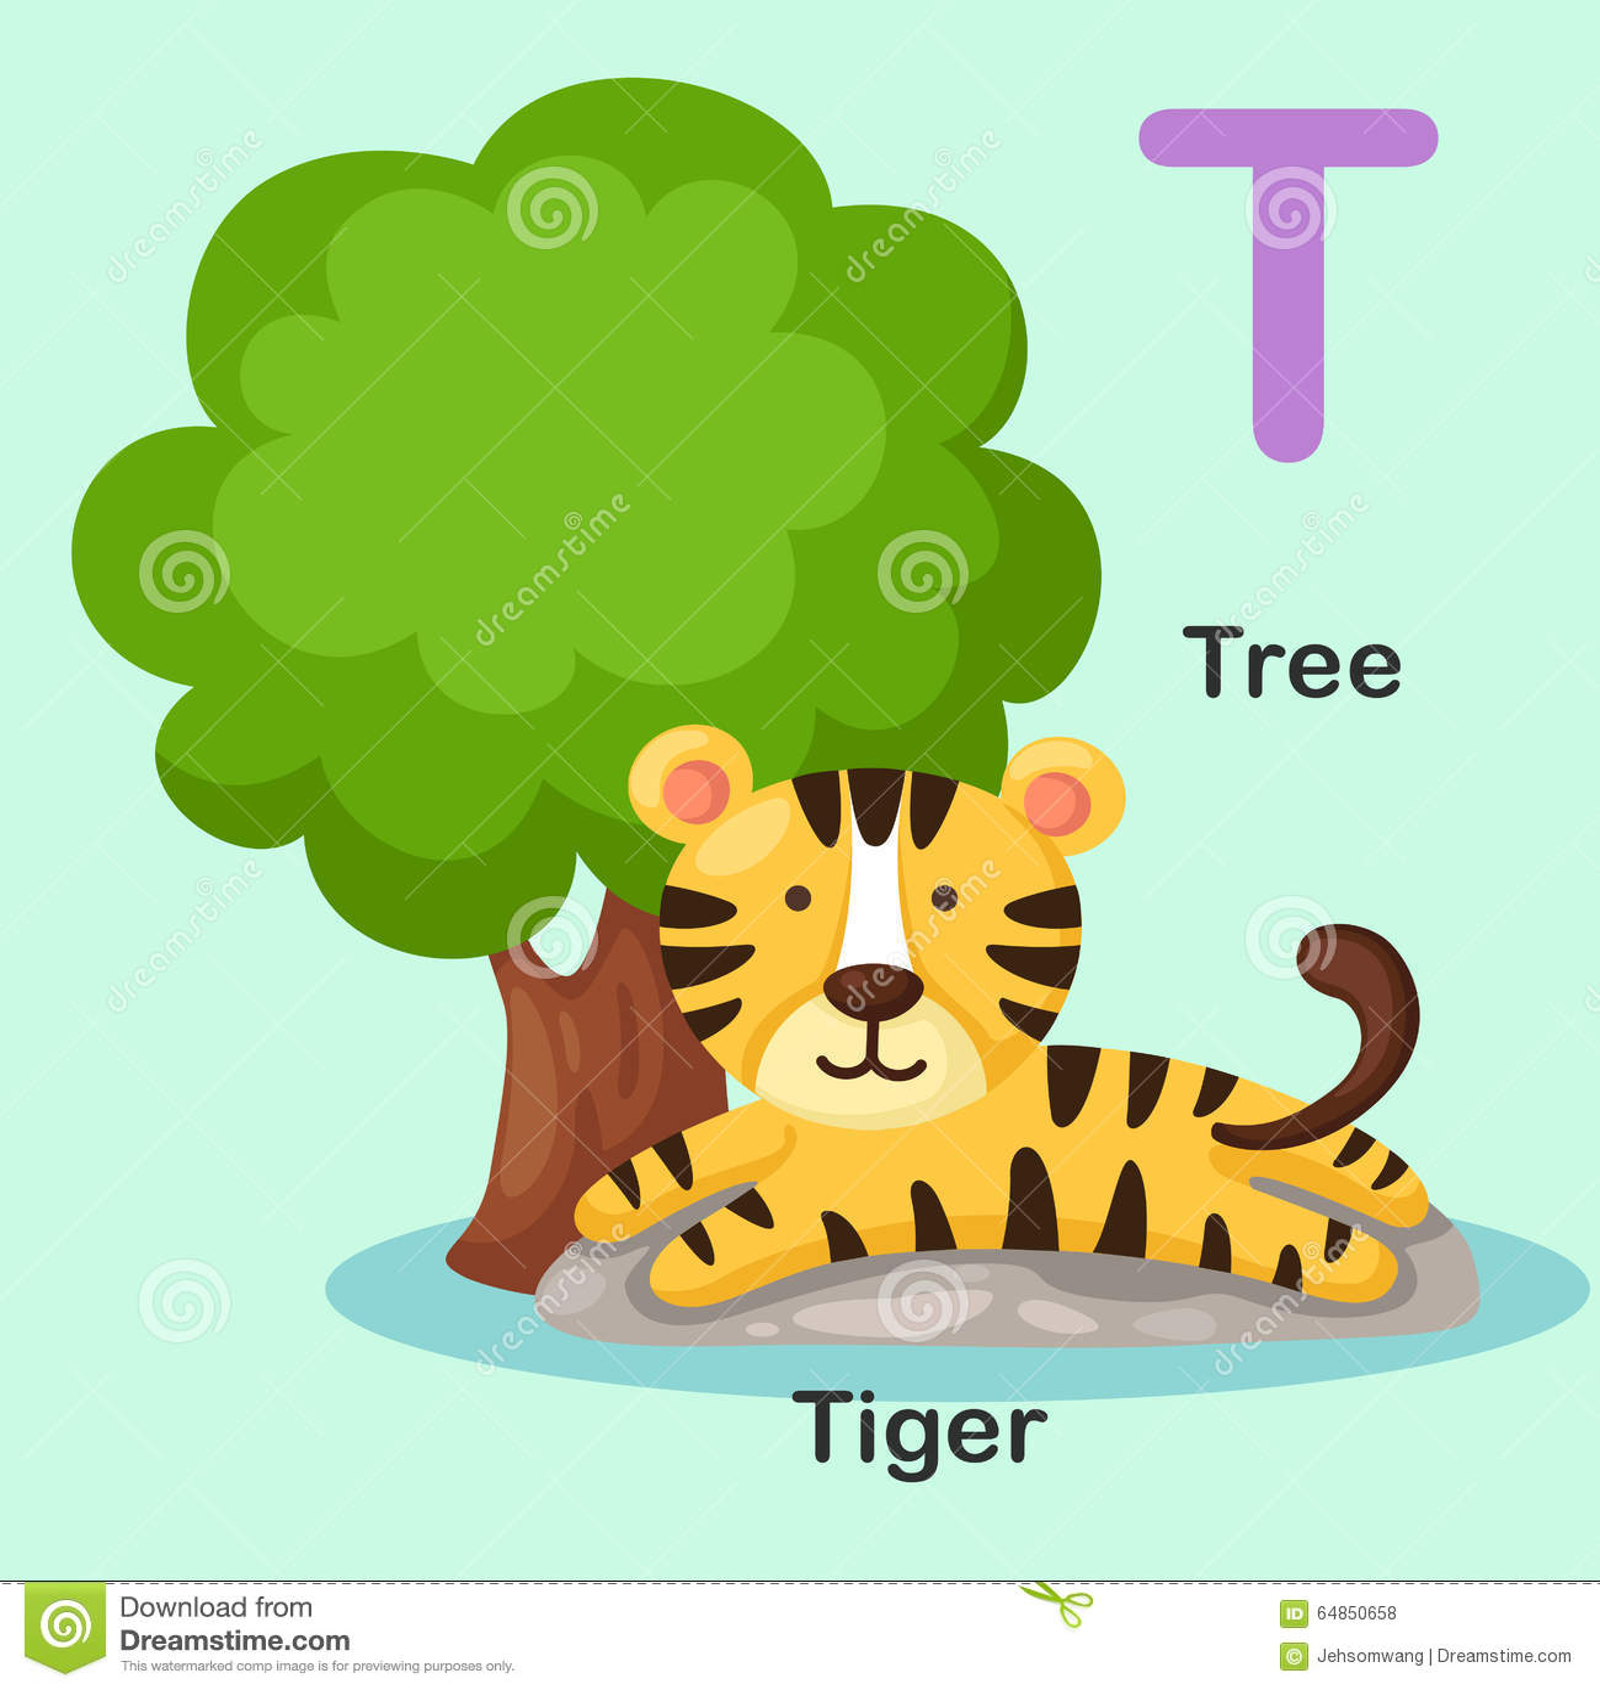 Illustration Animal Alphabet Letter T Tree Tiger Stock